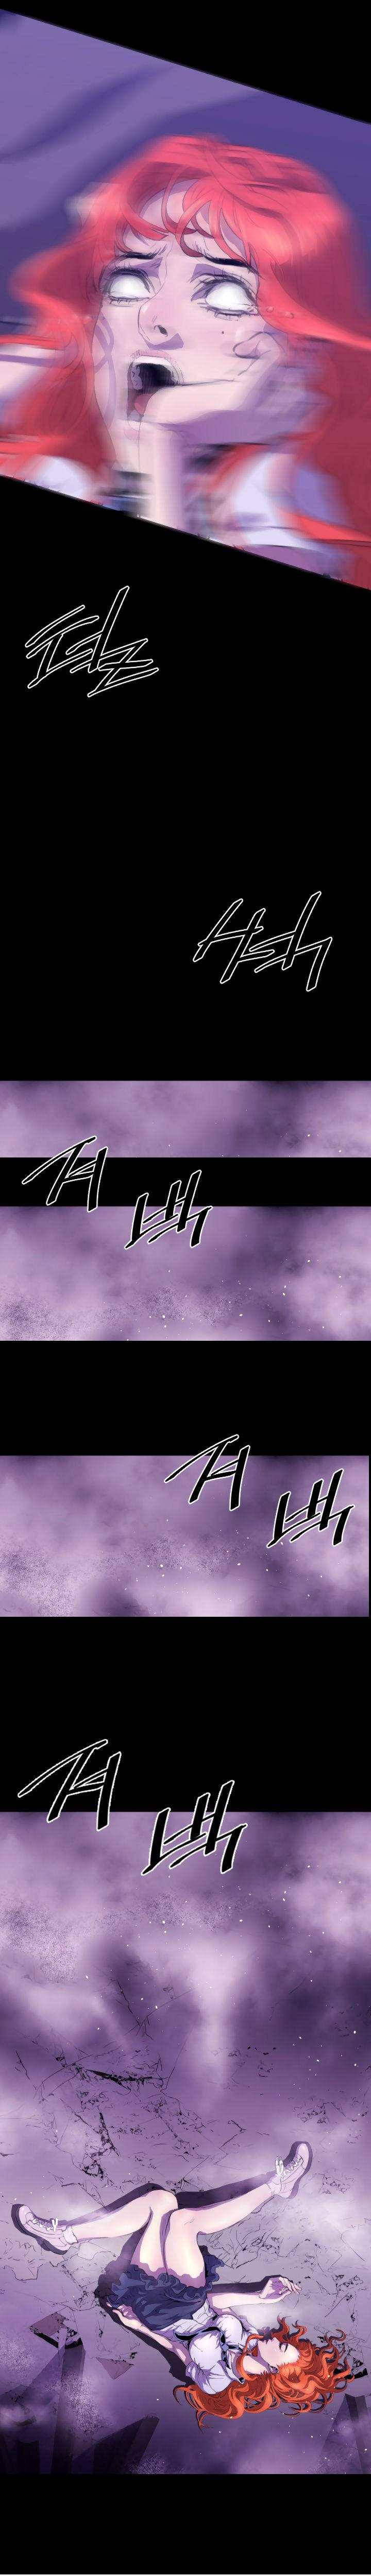 Balance - Chapter 16